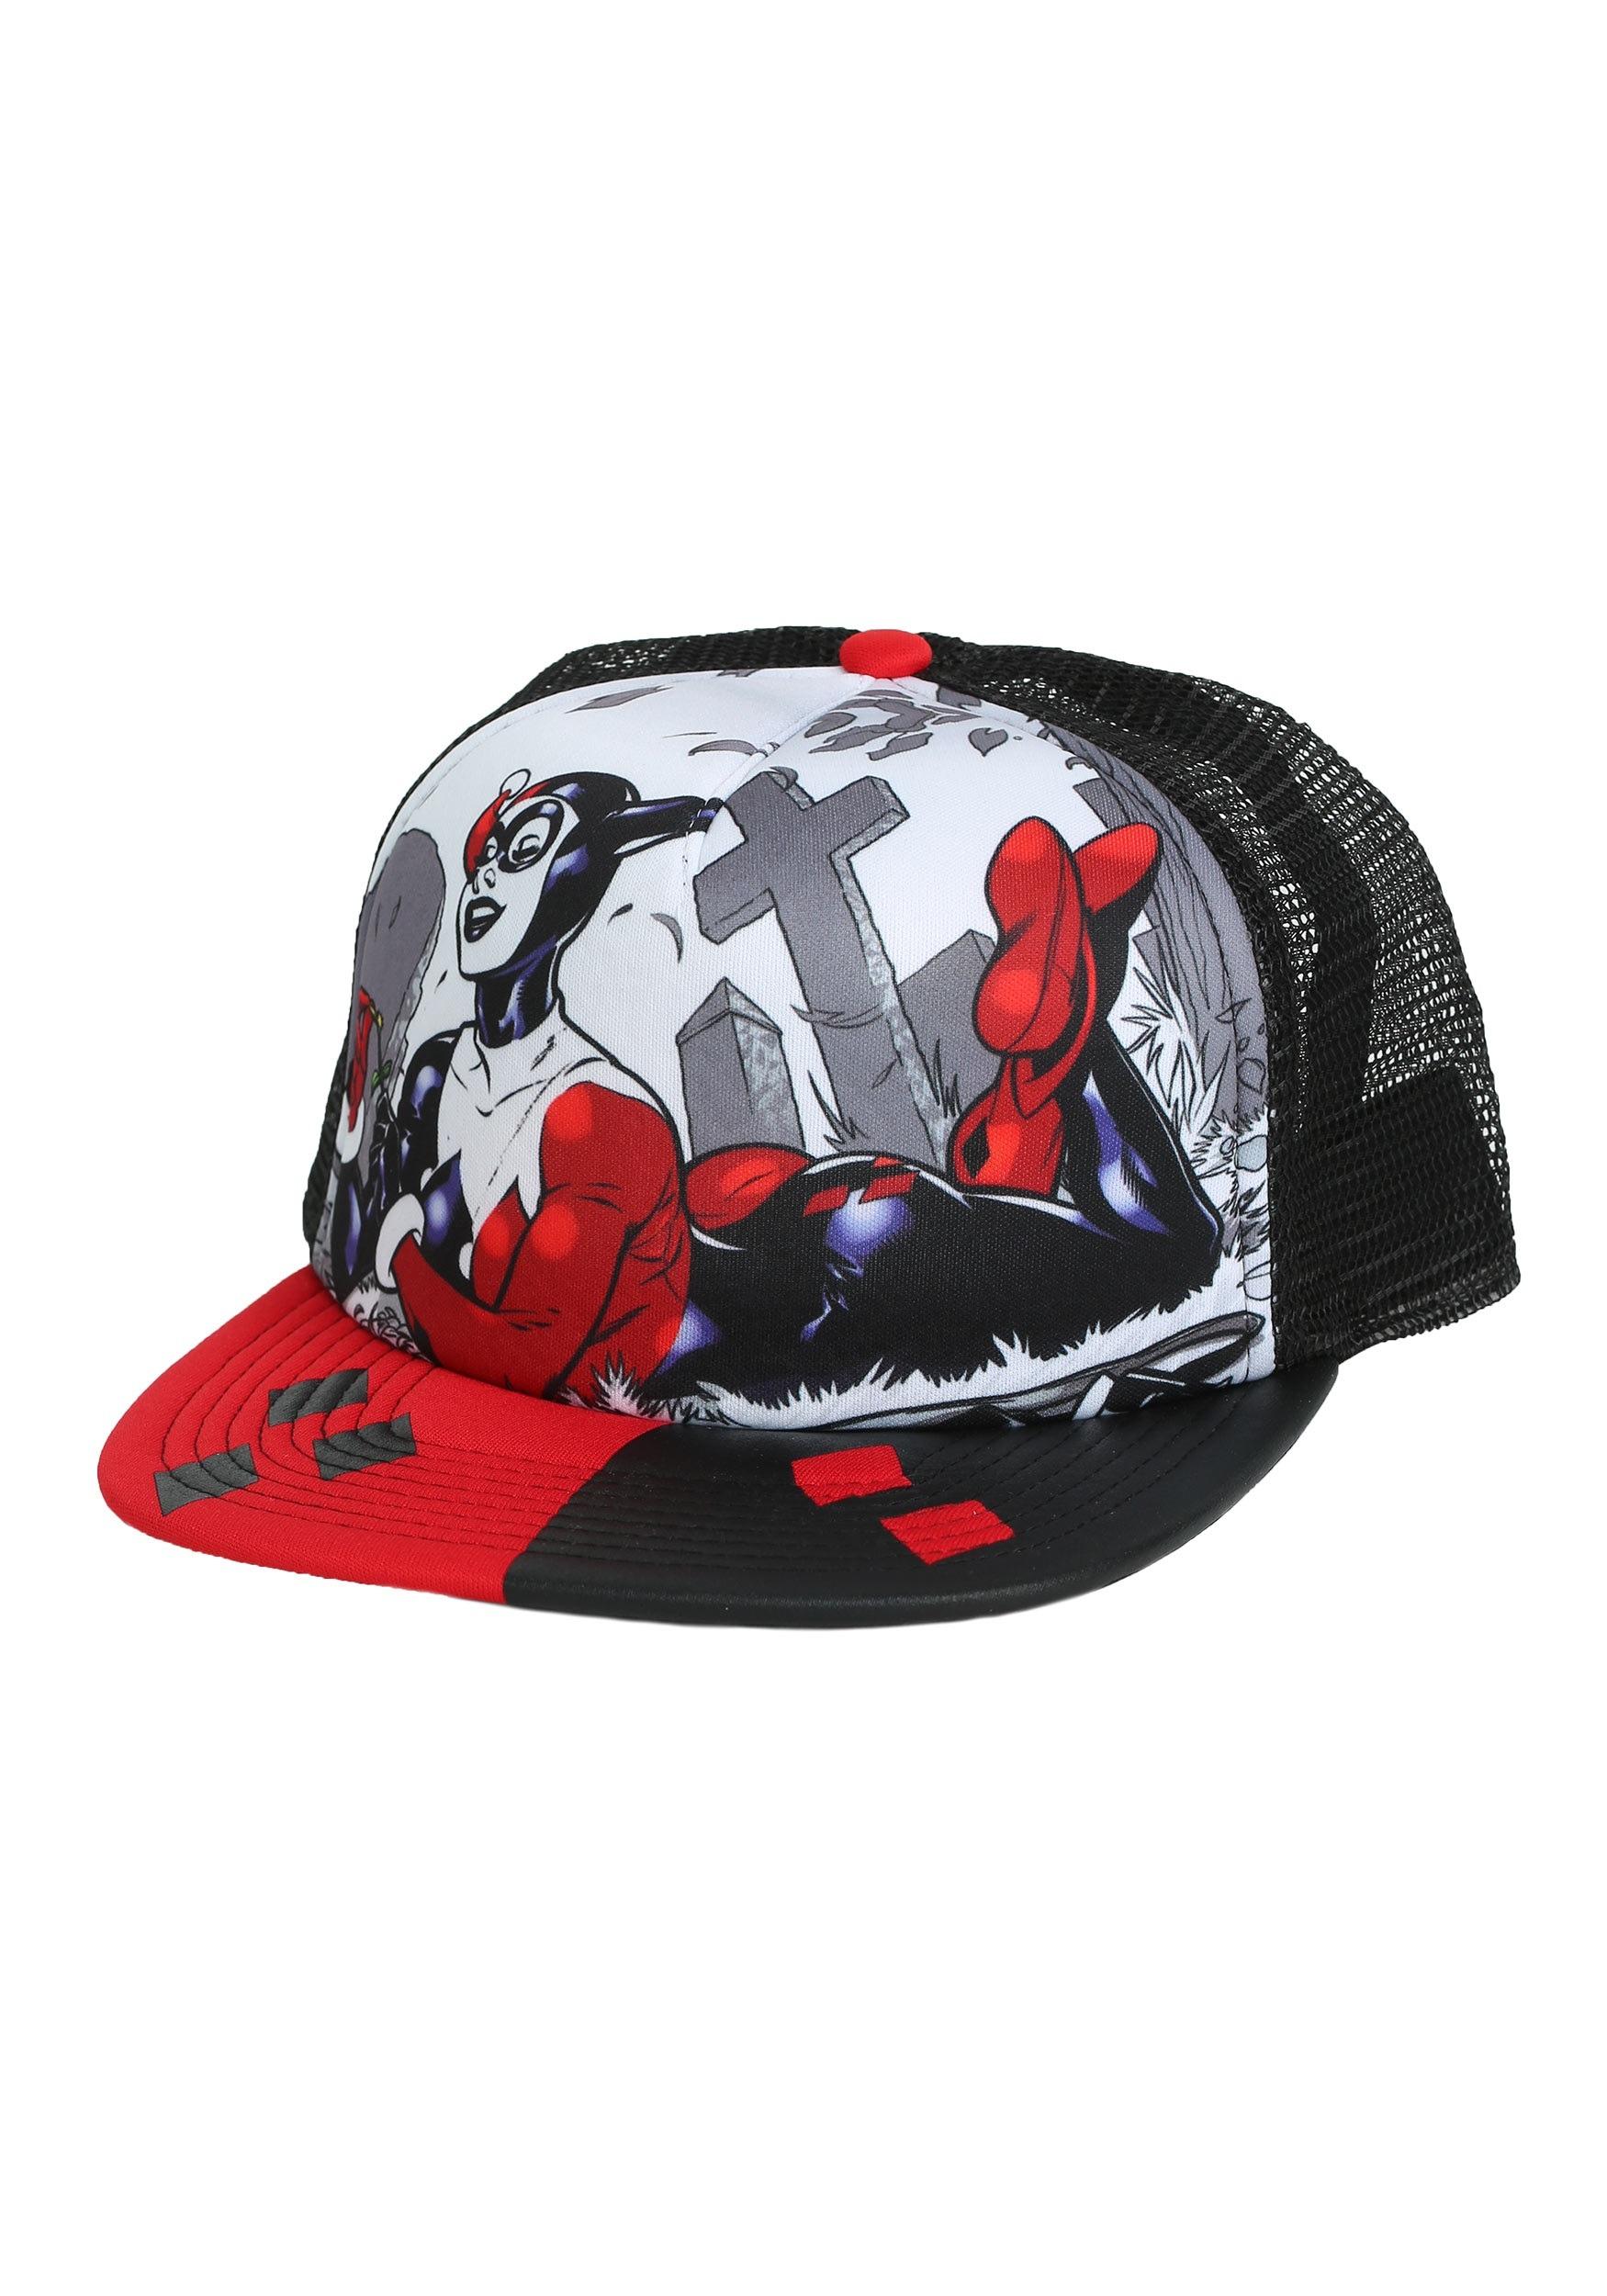 dea30d214f4 dc-harley-quinn-trucker-hat.jpg